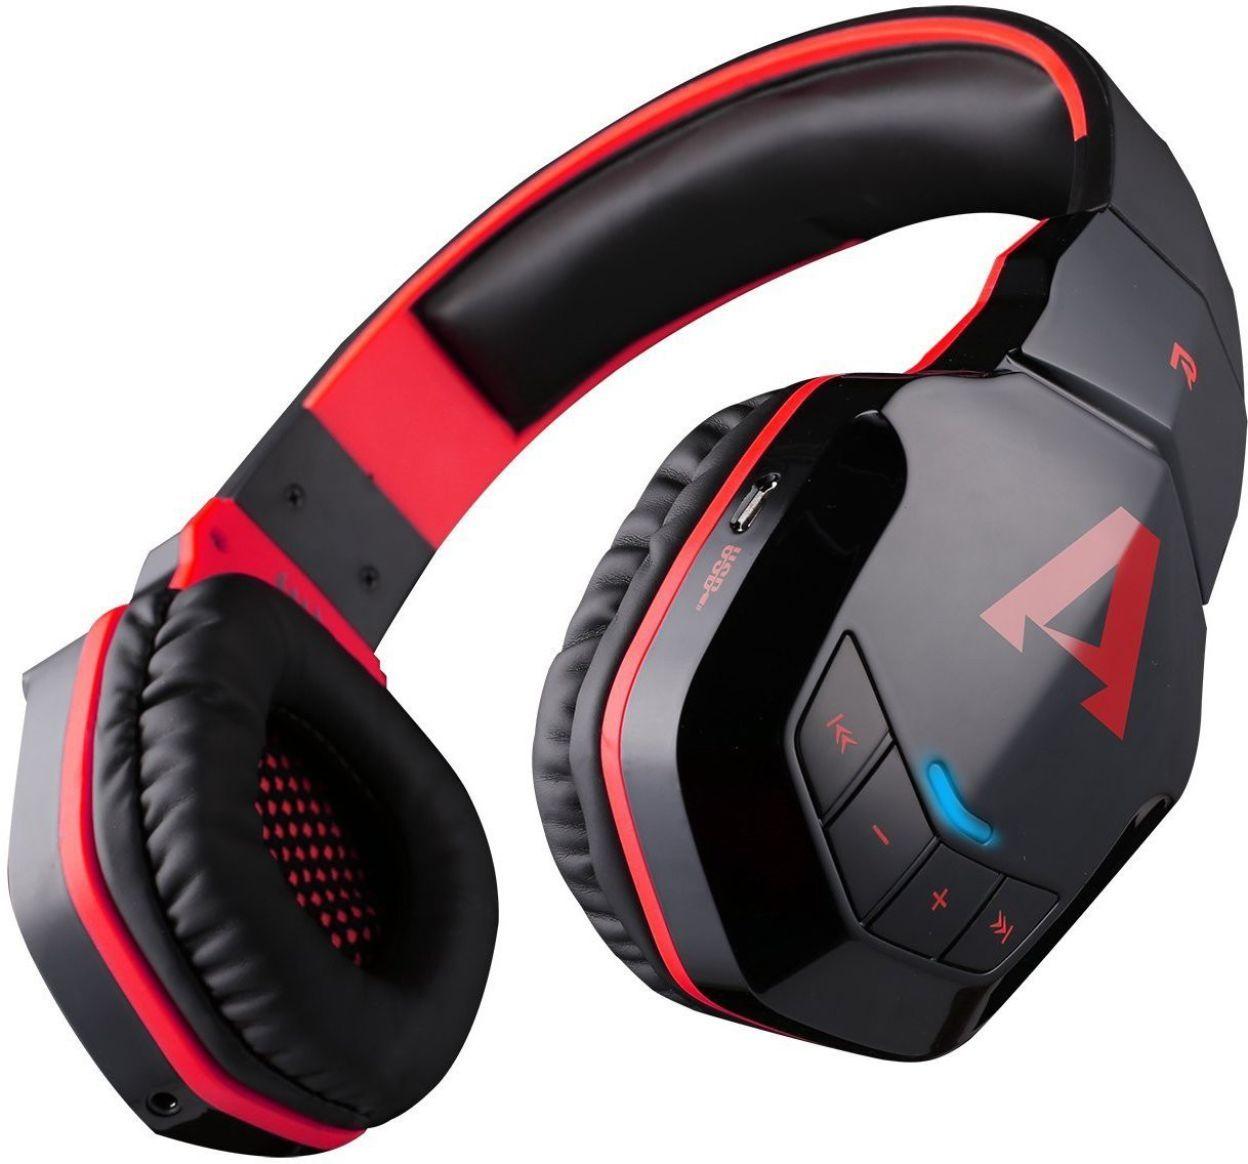 Topprice In Price Comparison In India Headphones Bluetooth Headphones Wireless Best Headphones